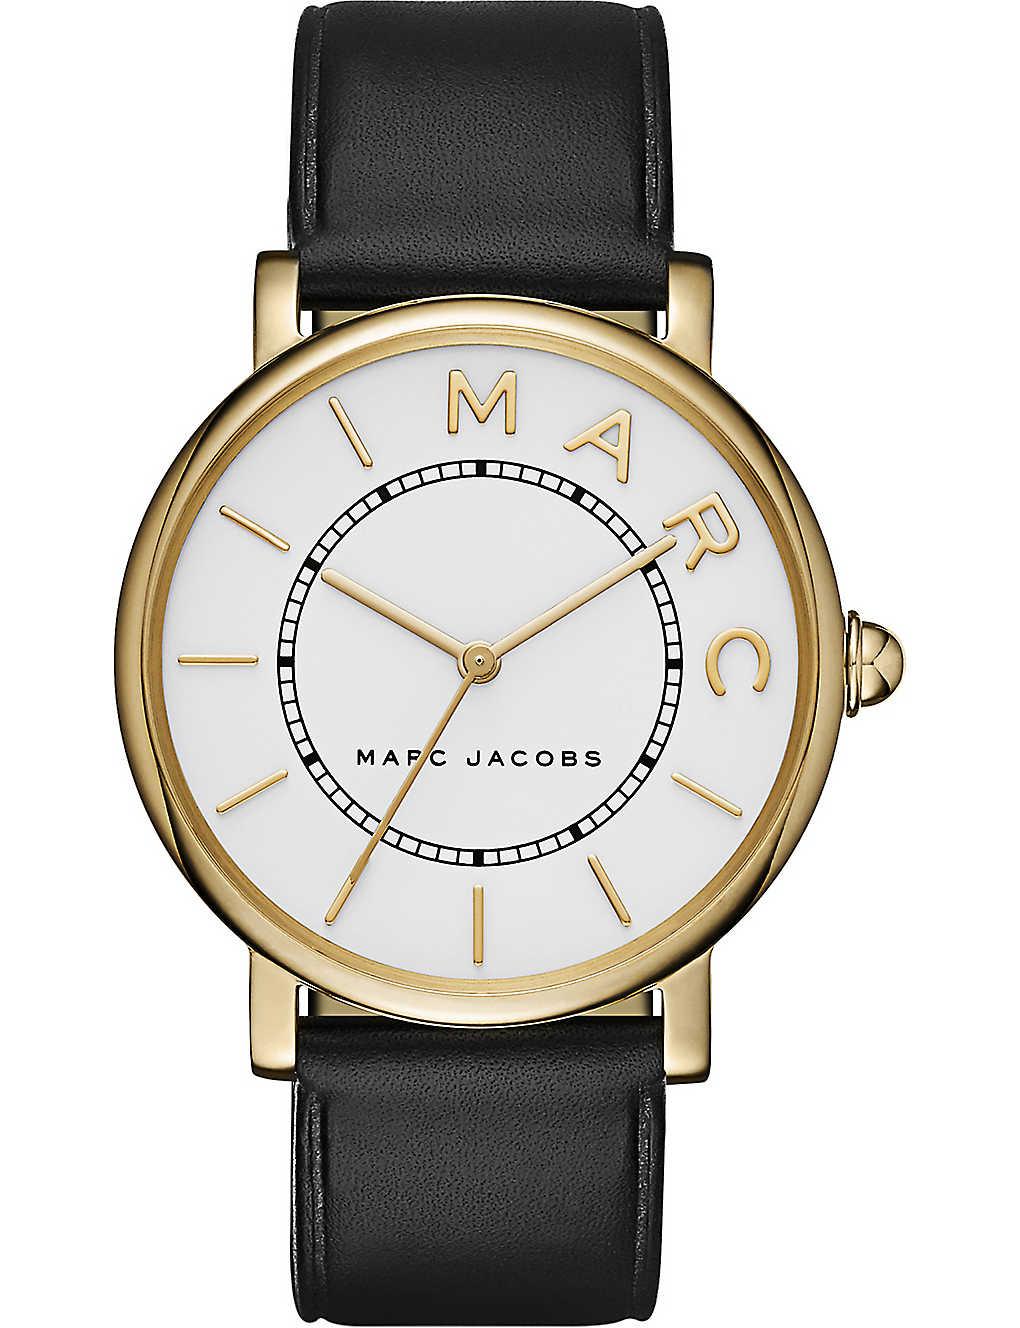 79e0f06208a2d MARC JACOBS - Roxy gold watch | Selfridges.com